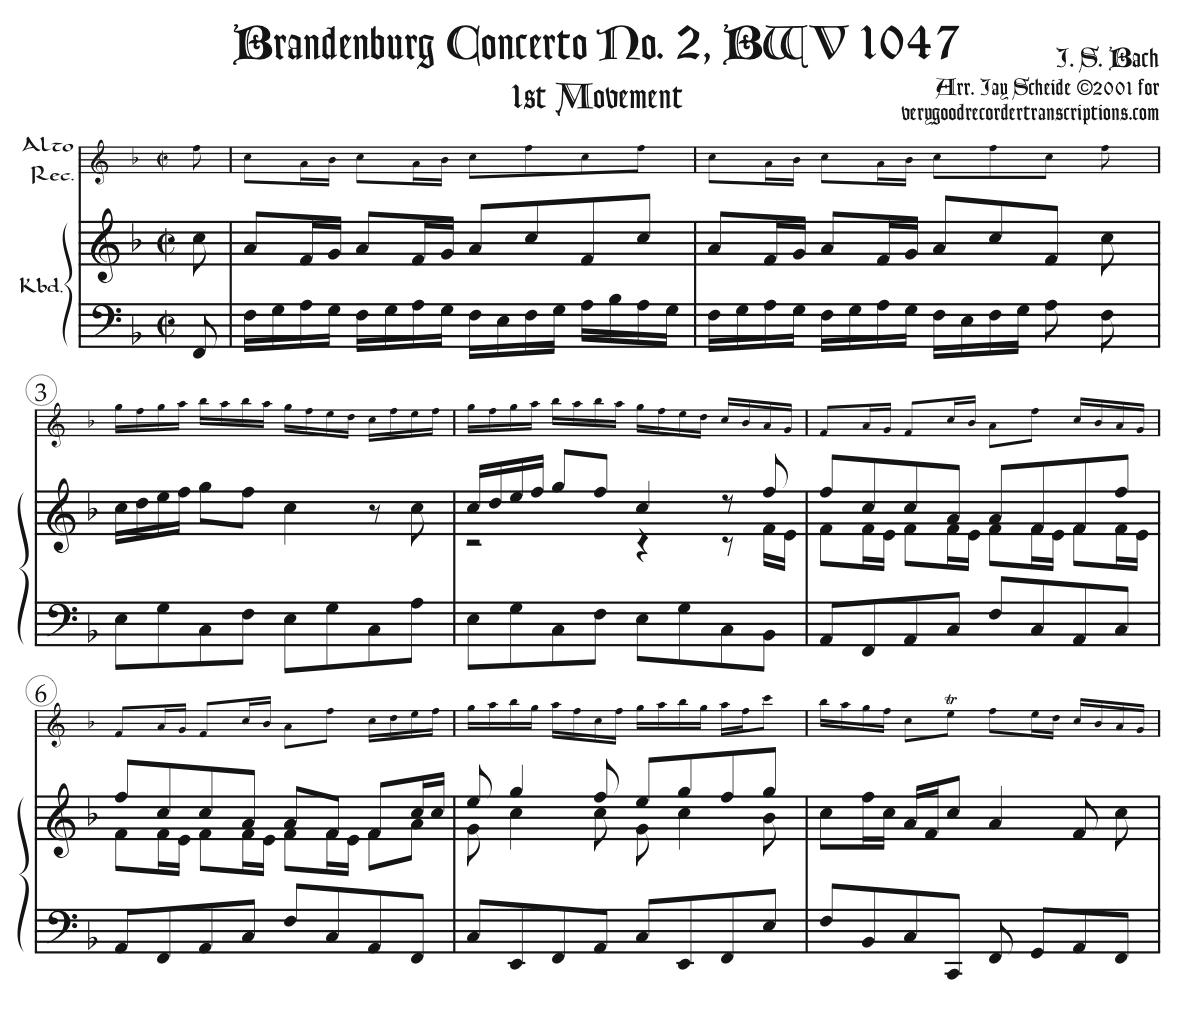 Brandenburg Concerto No. 2, BWV 1047